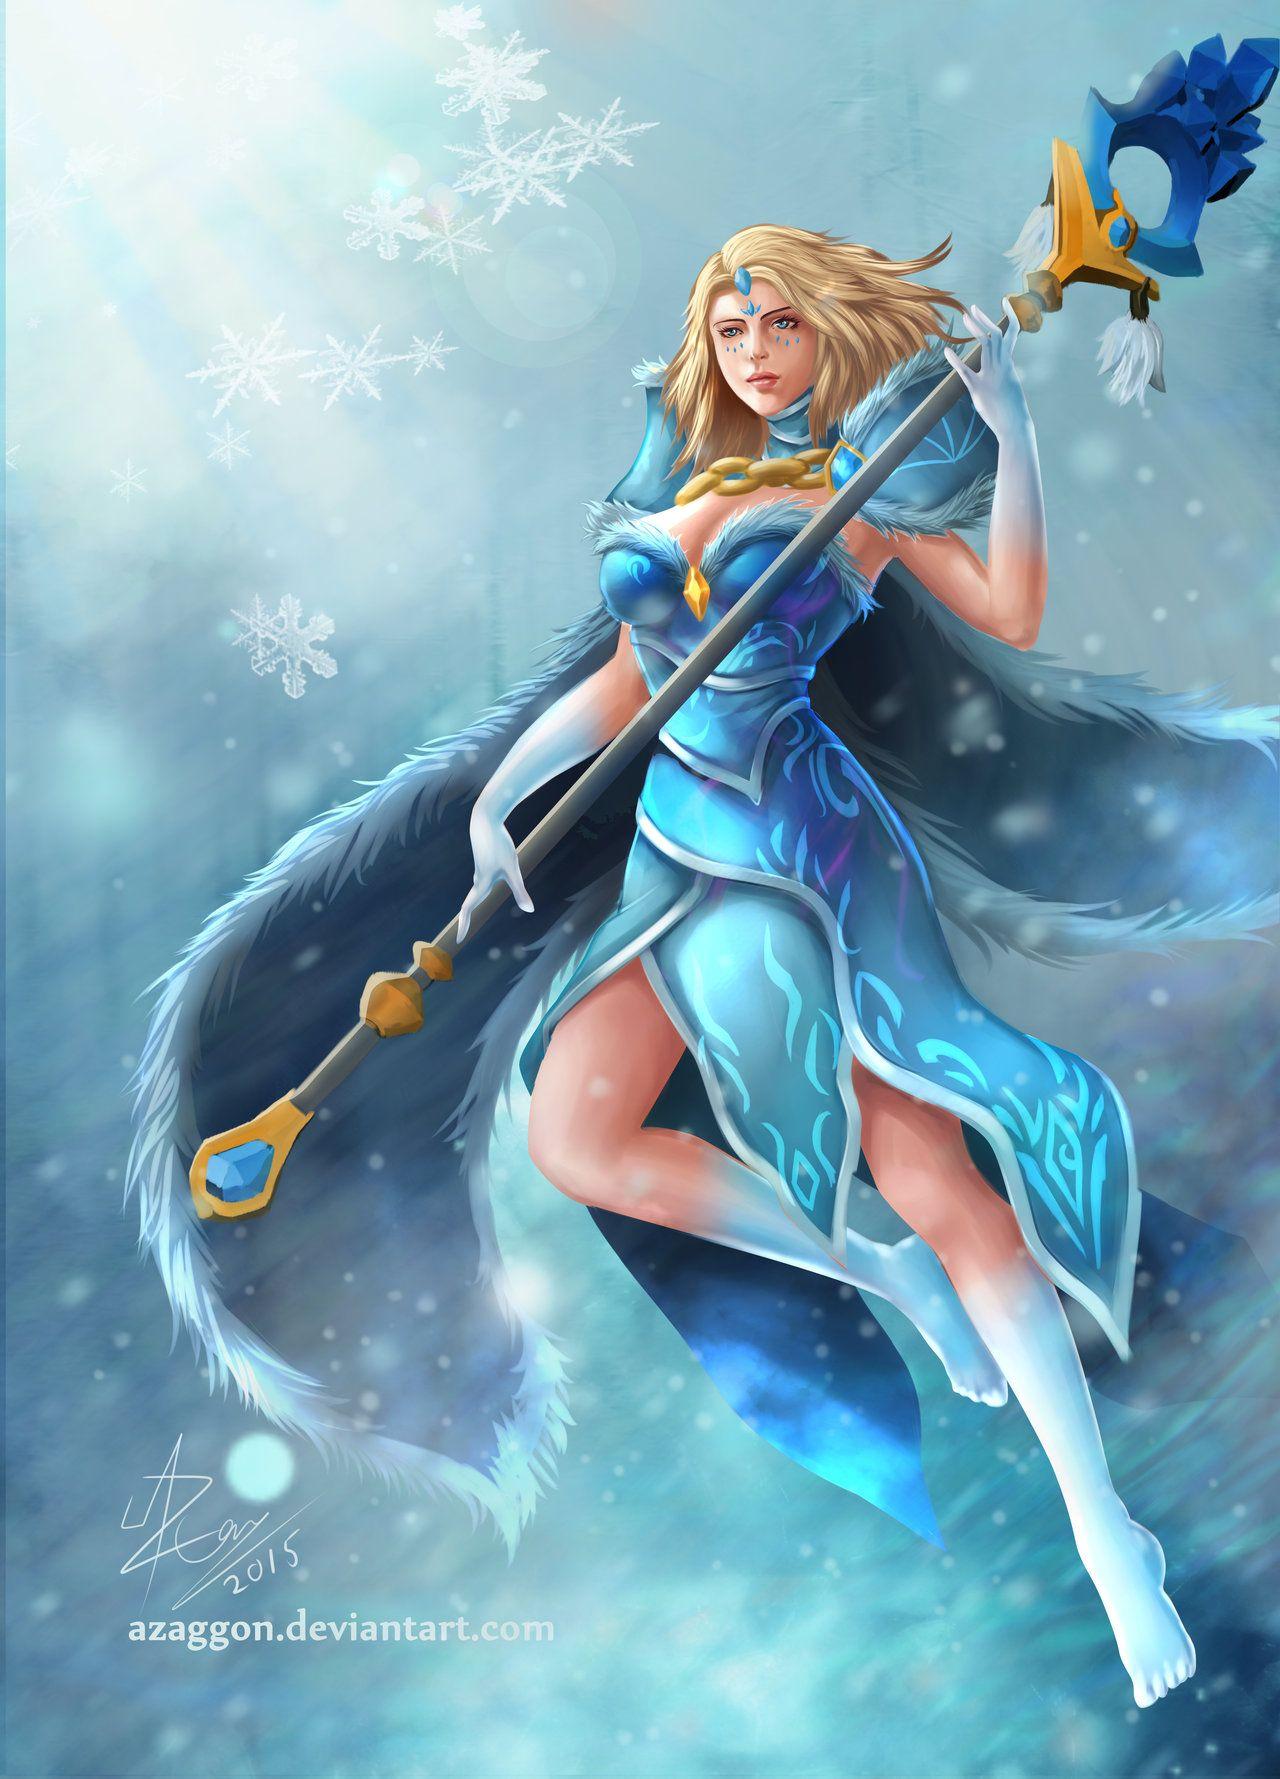 crystal maiden arcana by azaggon deviantart com on deviantart my